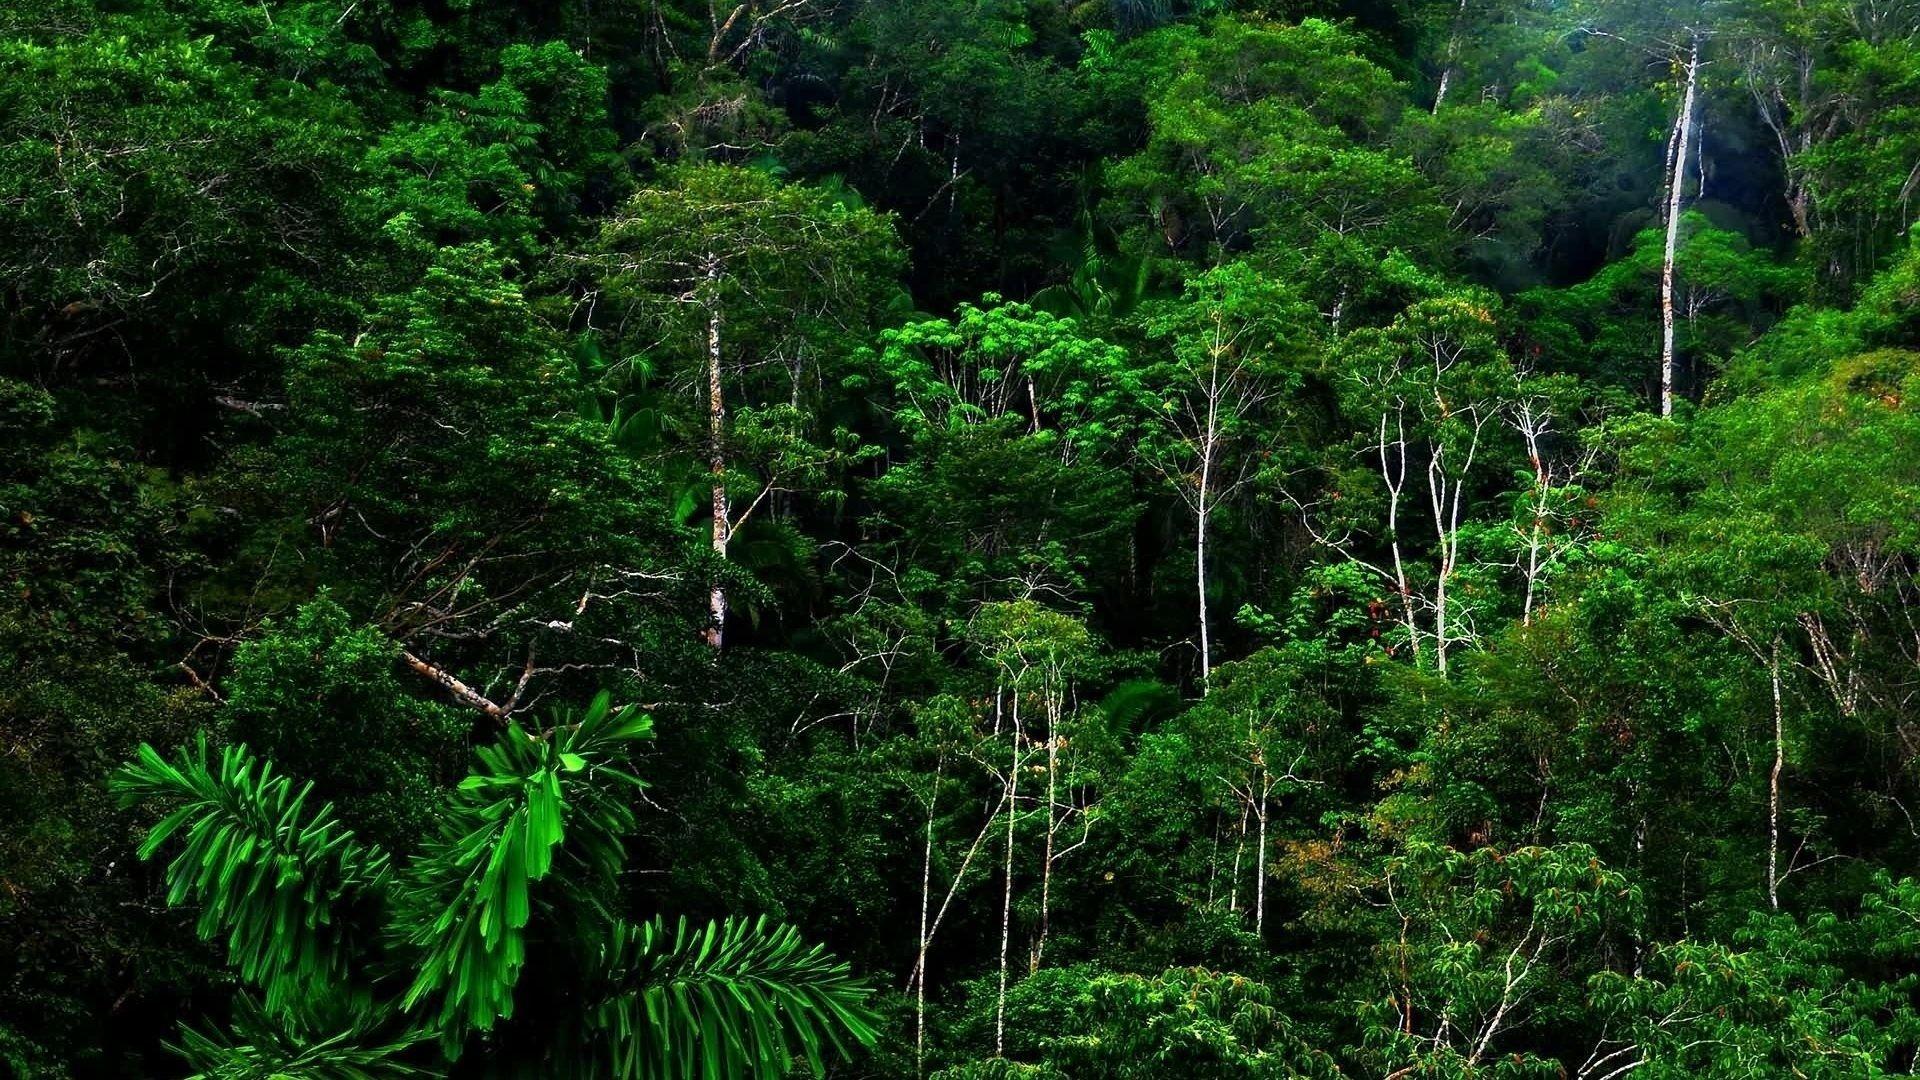 Jungle Rain Wallpapers - Top Free Jungle Rain Backgrounds ...